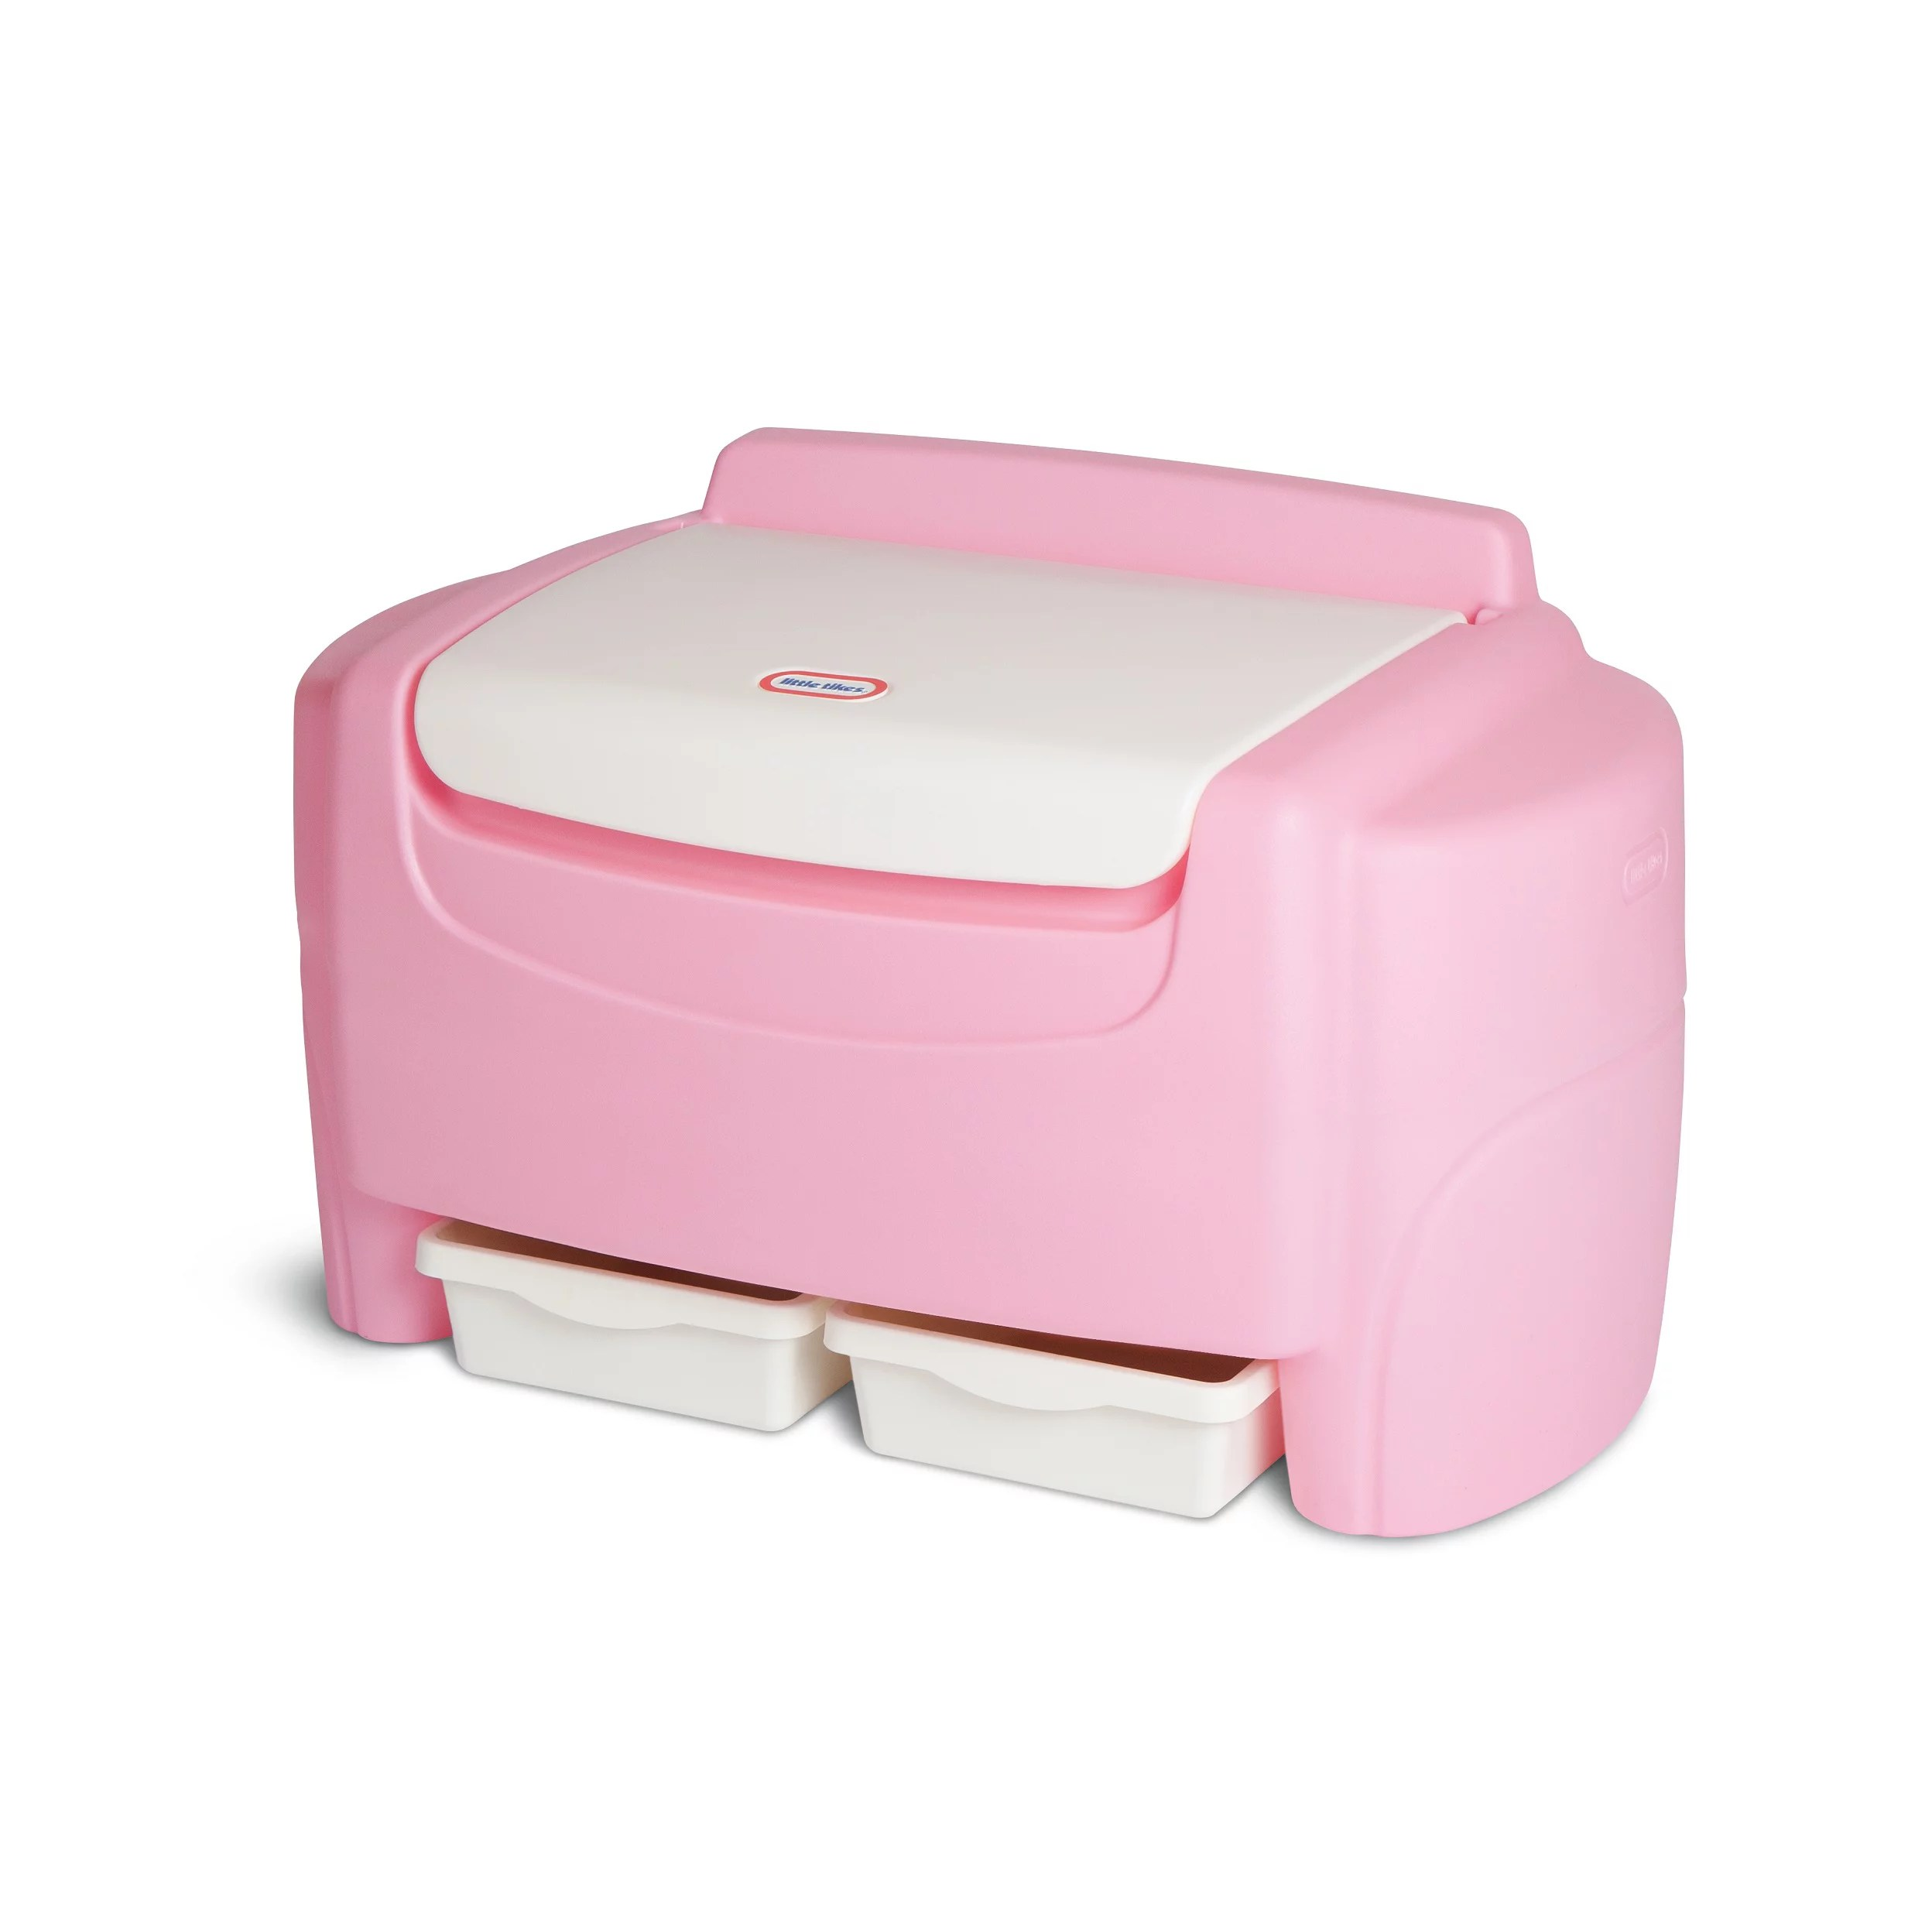 Little Tikes Sort N Store Toy Chest Toy Storage Pink